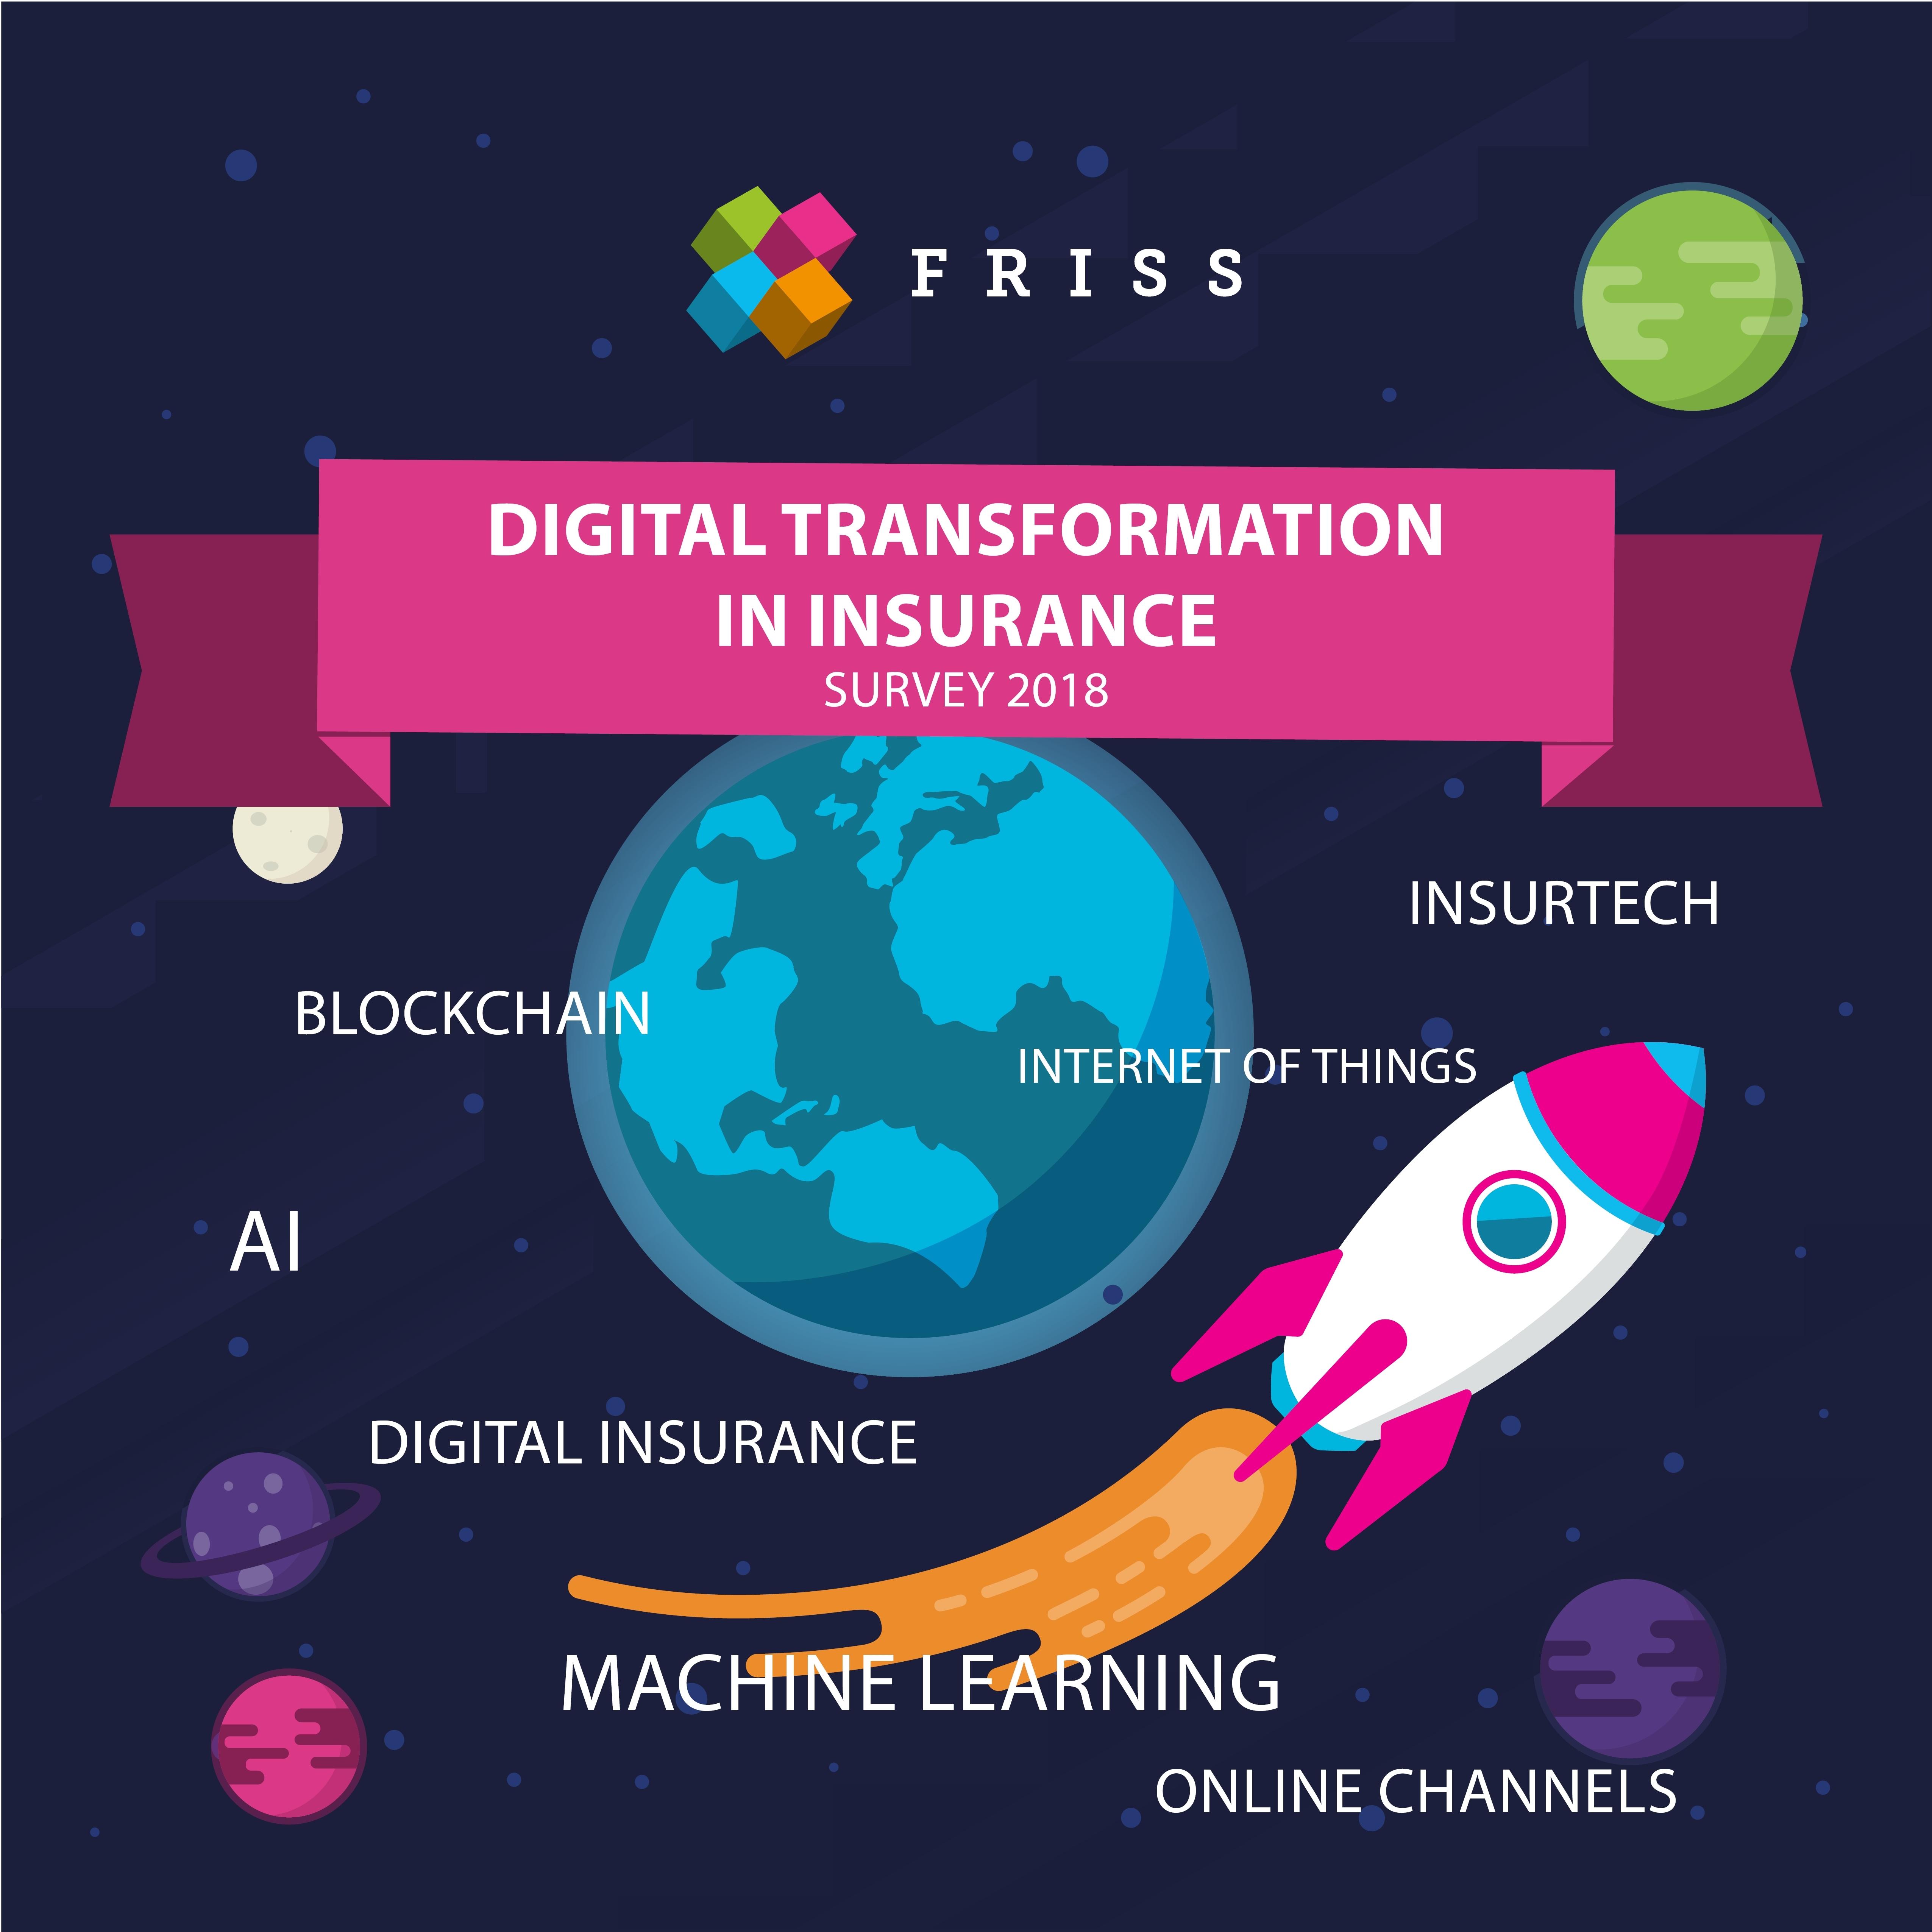 friss survey reveals big bang of digital transformation in insurance